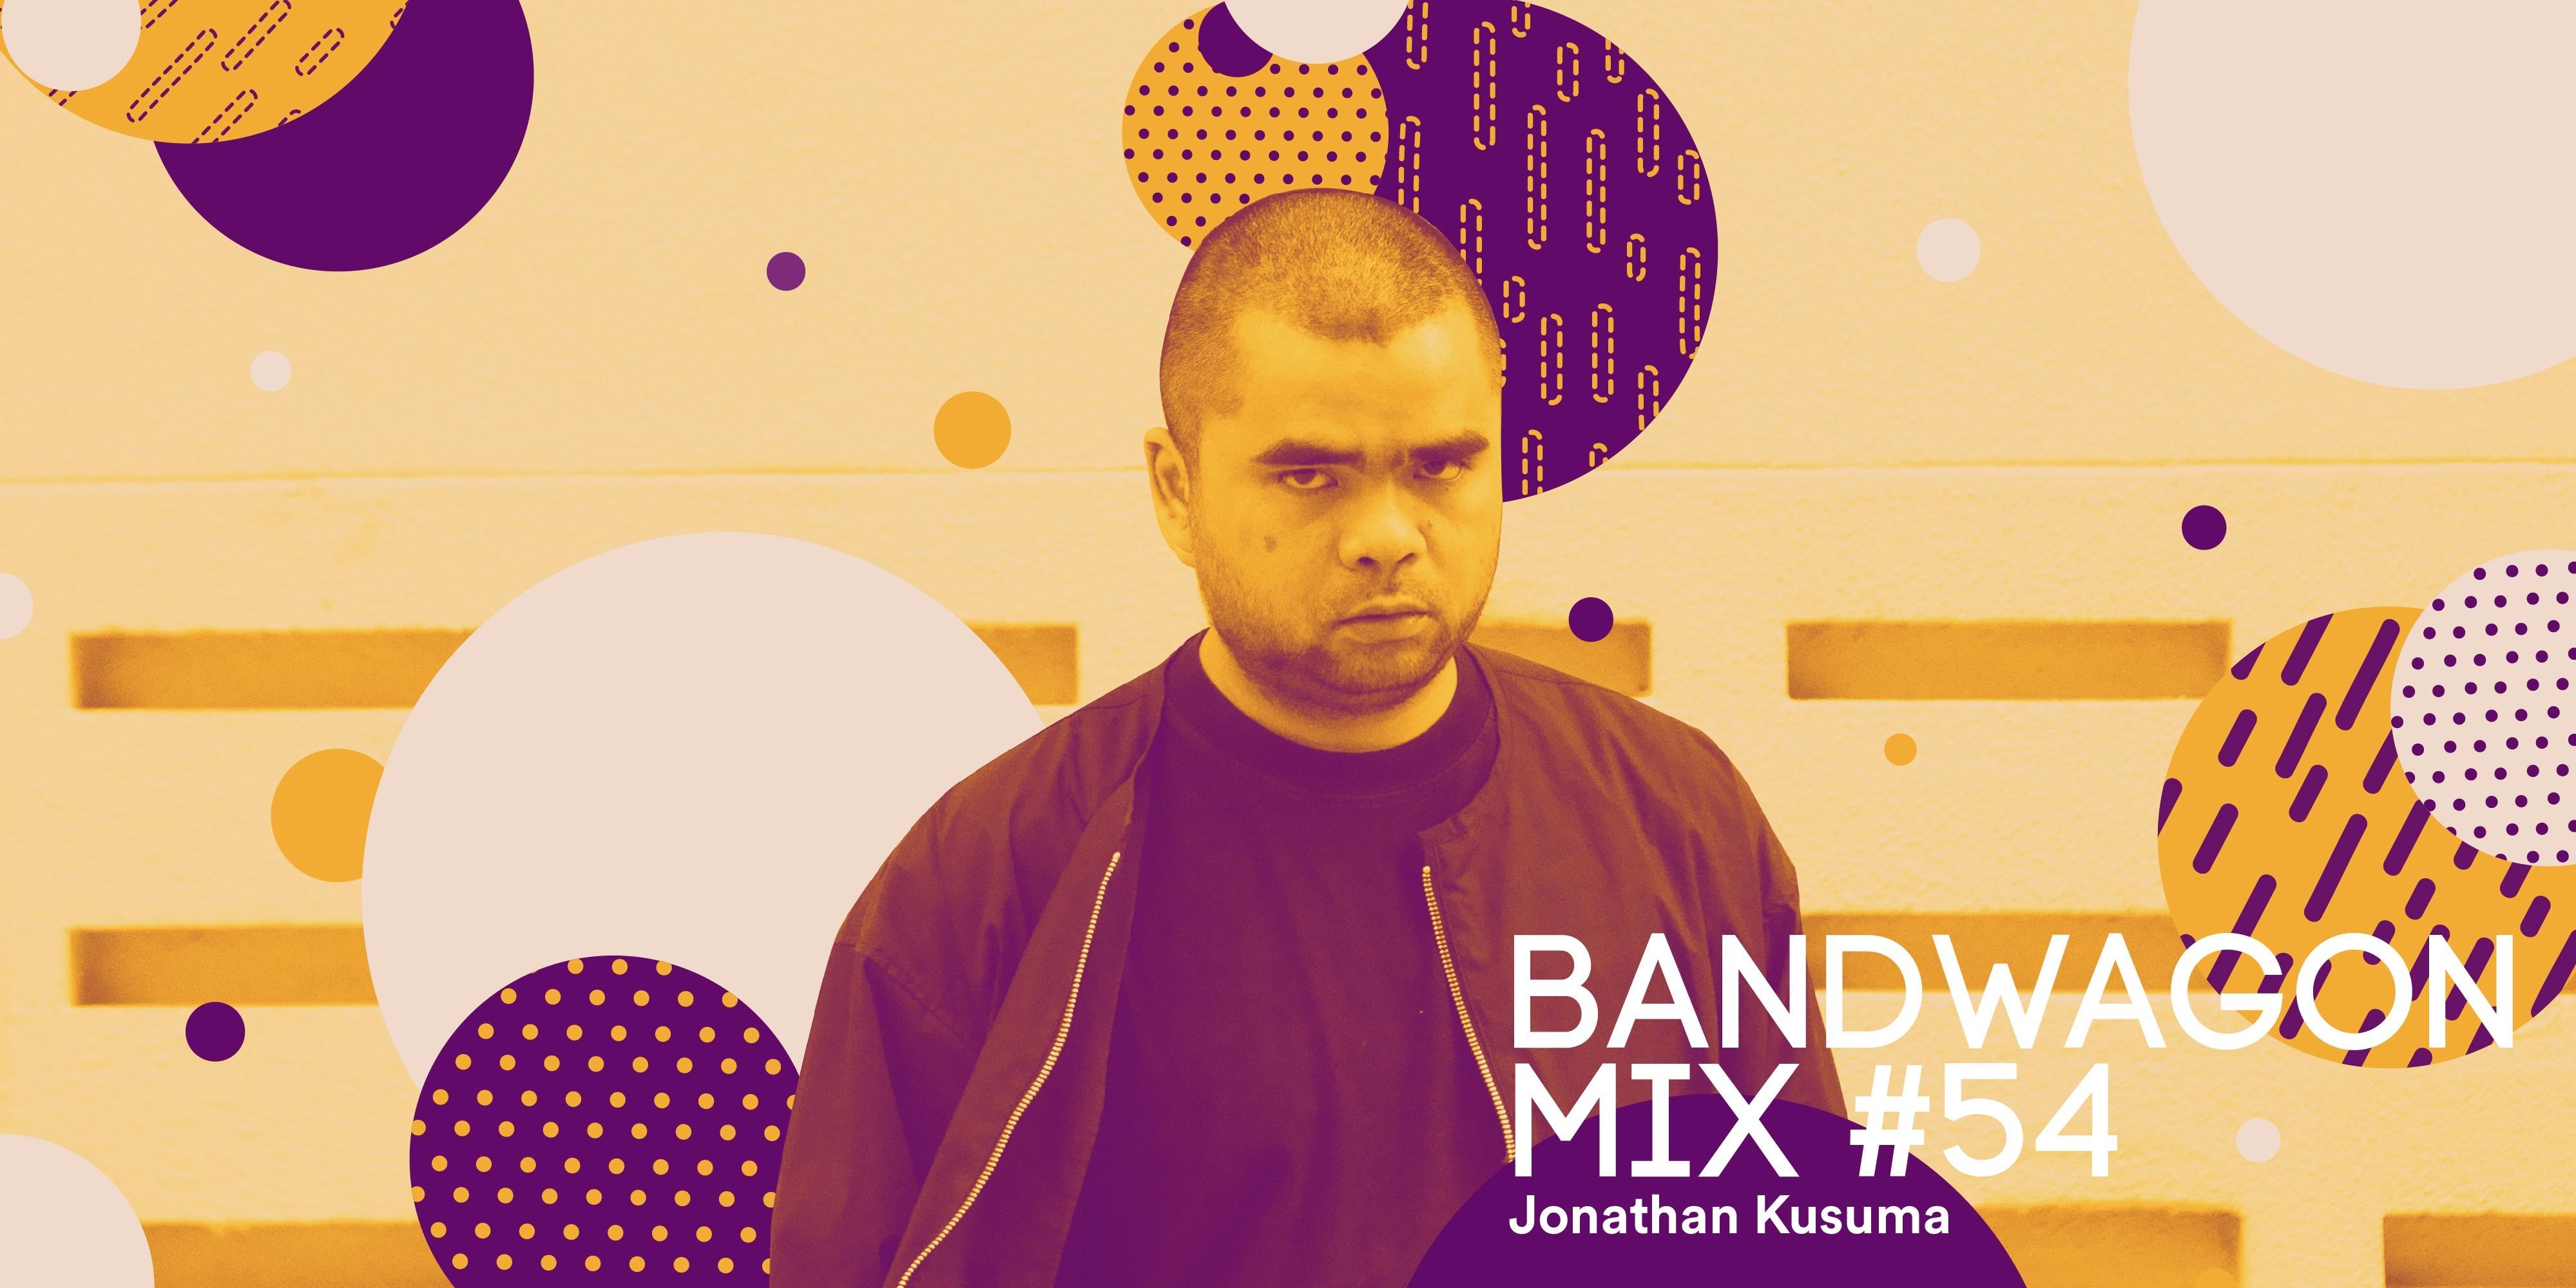 Bandwagon Mix #54: Jonathan Kusuma